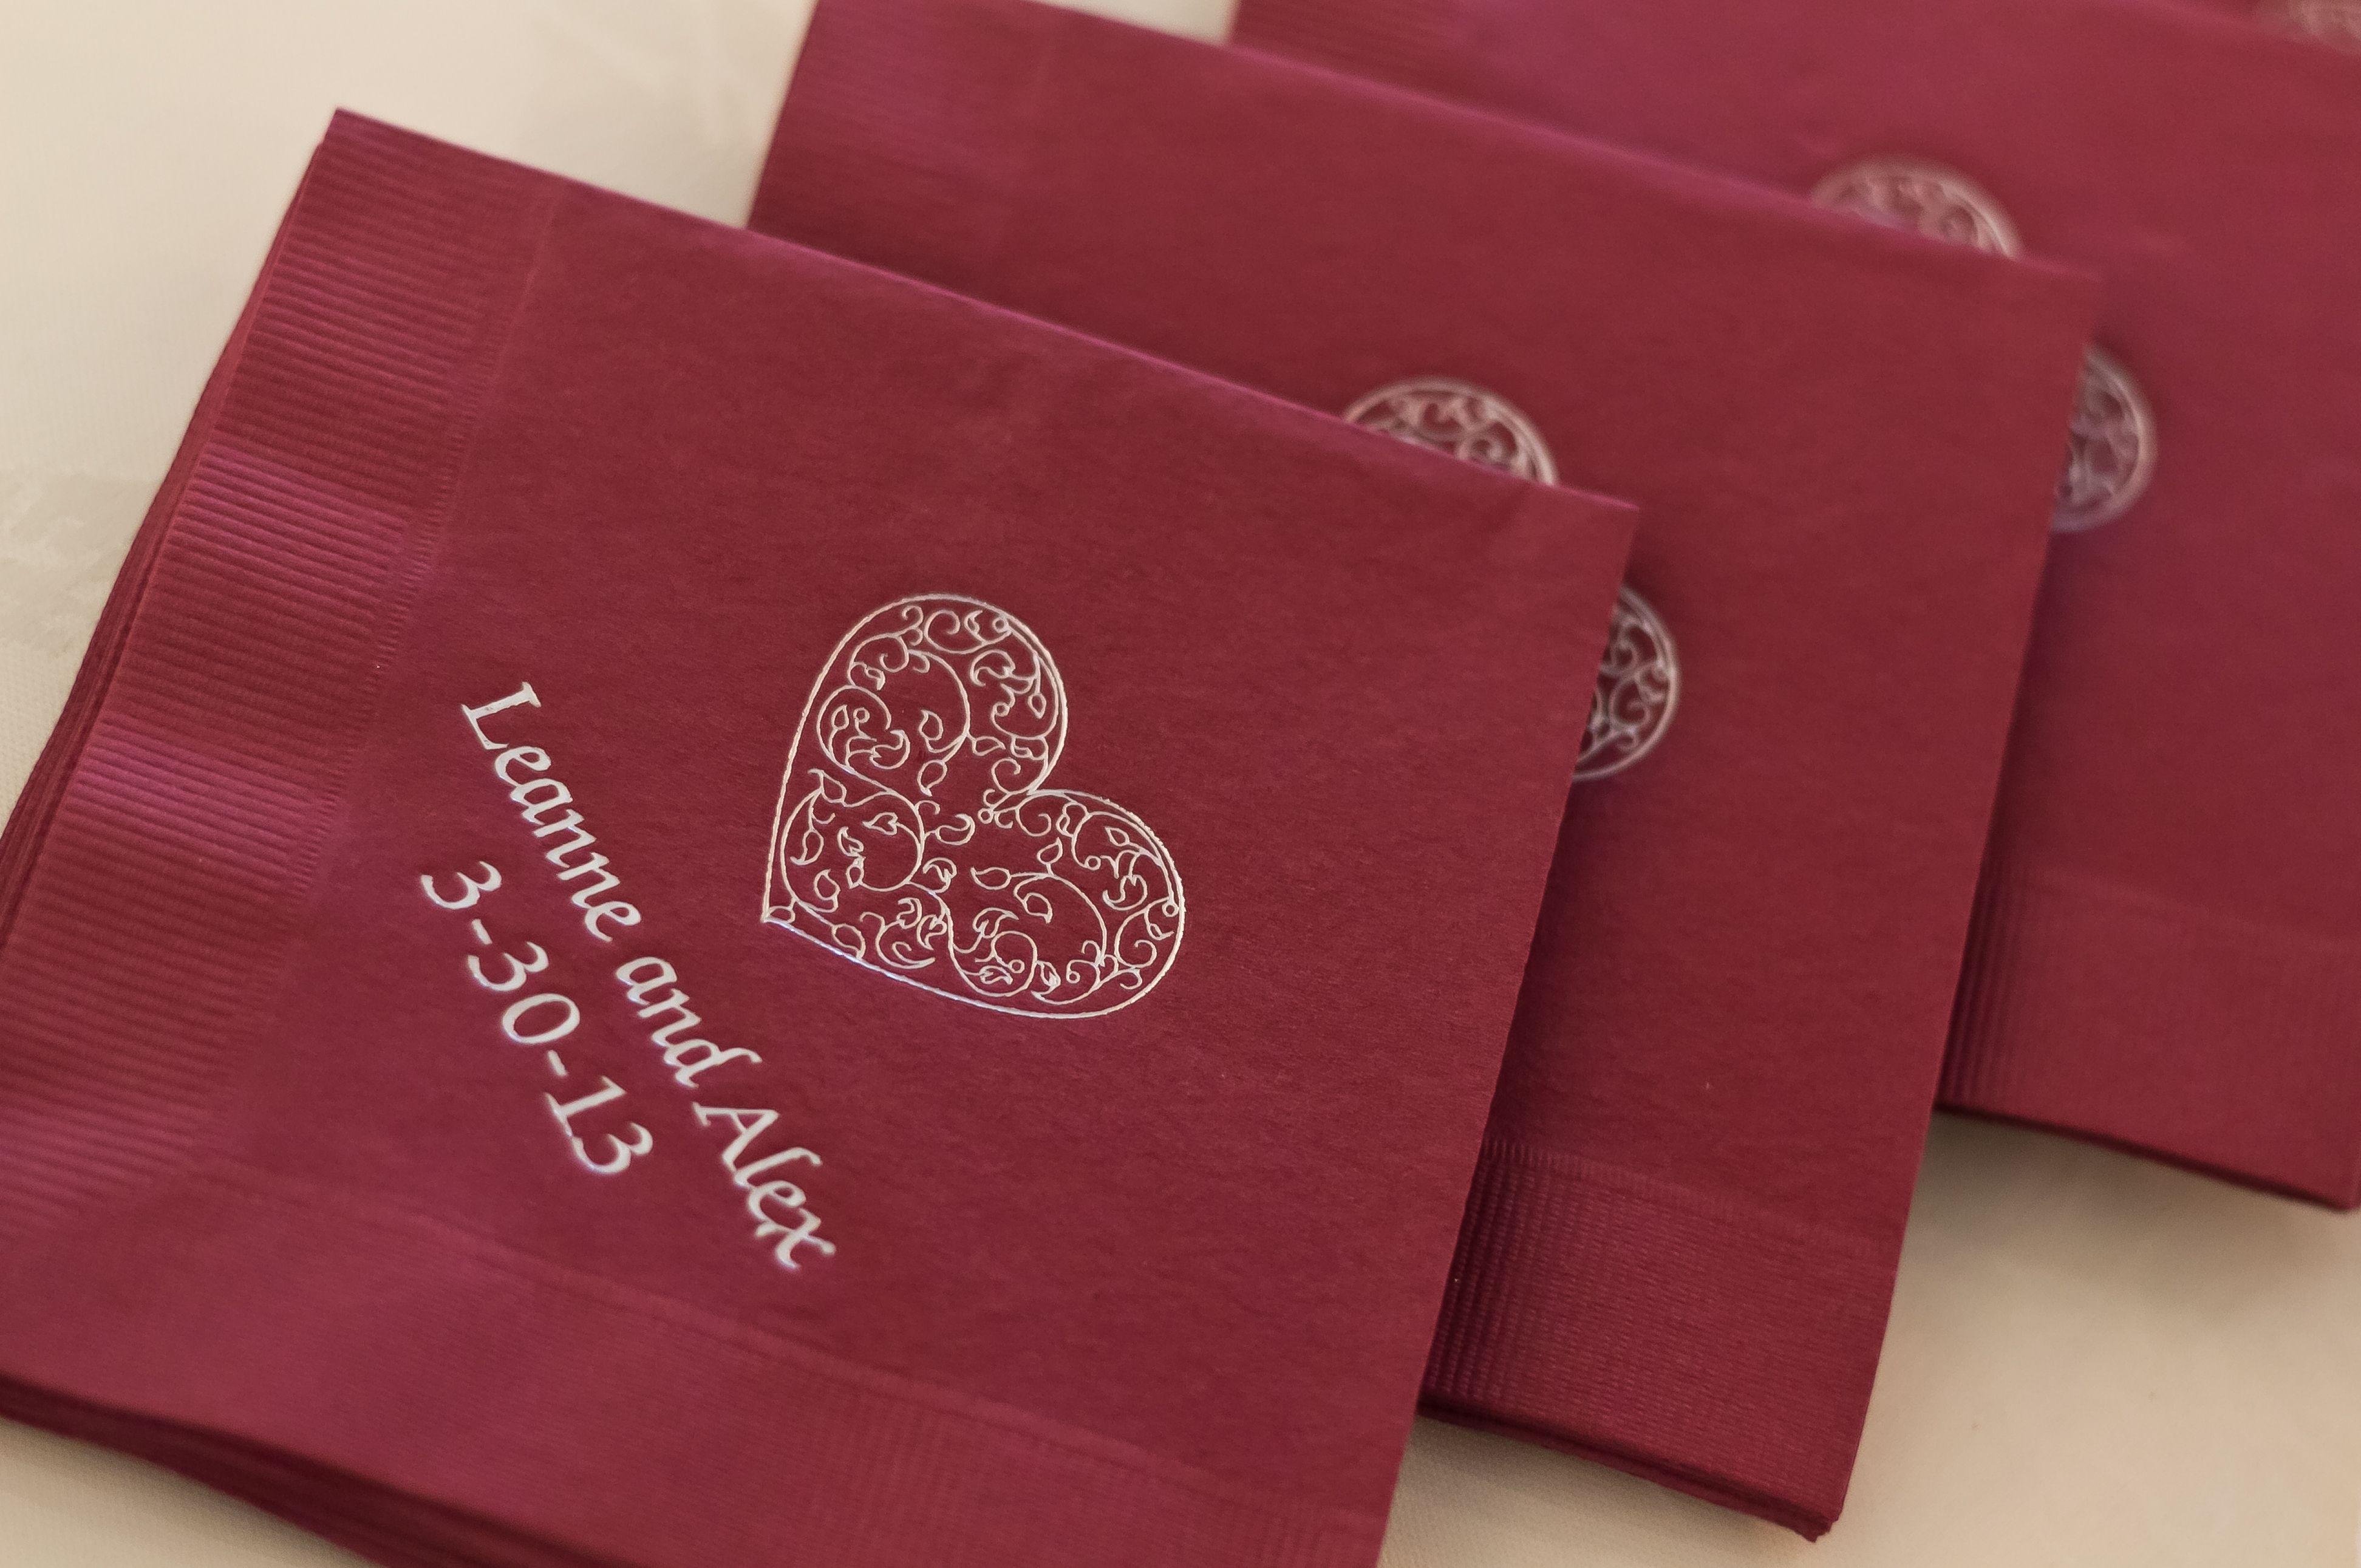 Deep red personalized napkins | My Wedding 3/30/13 | Pinterest | Wedding